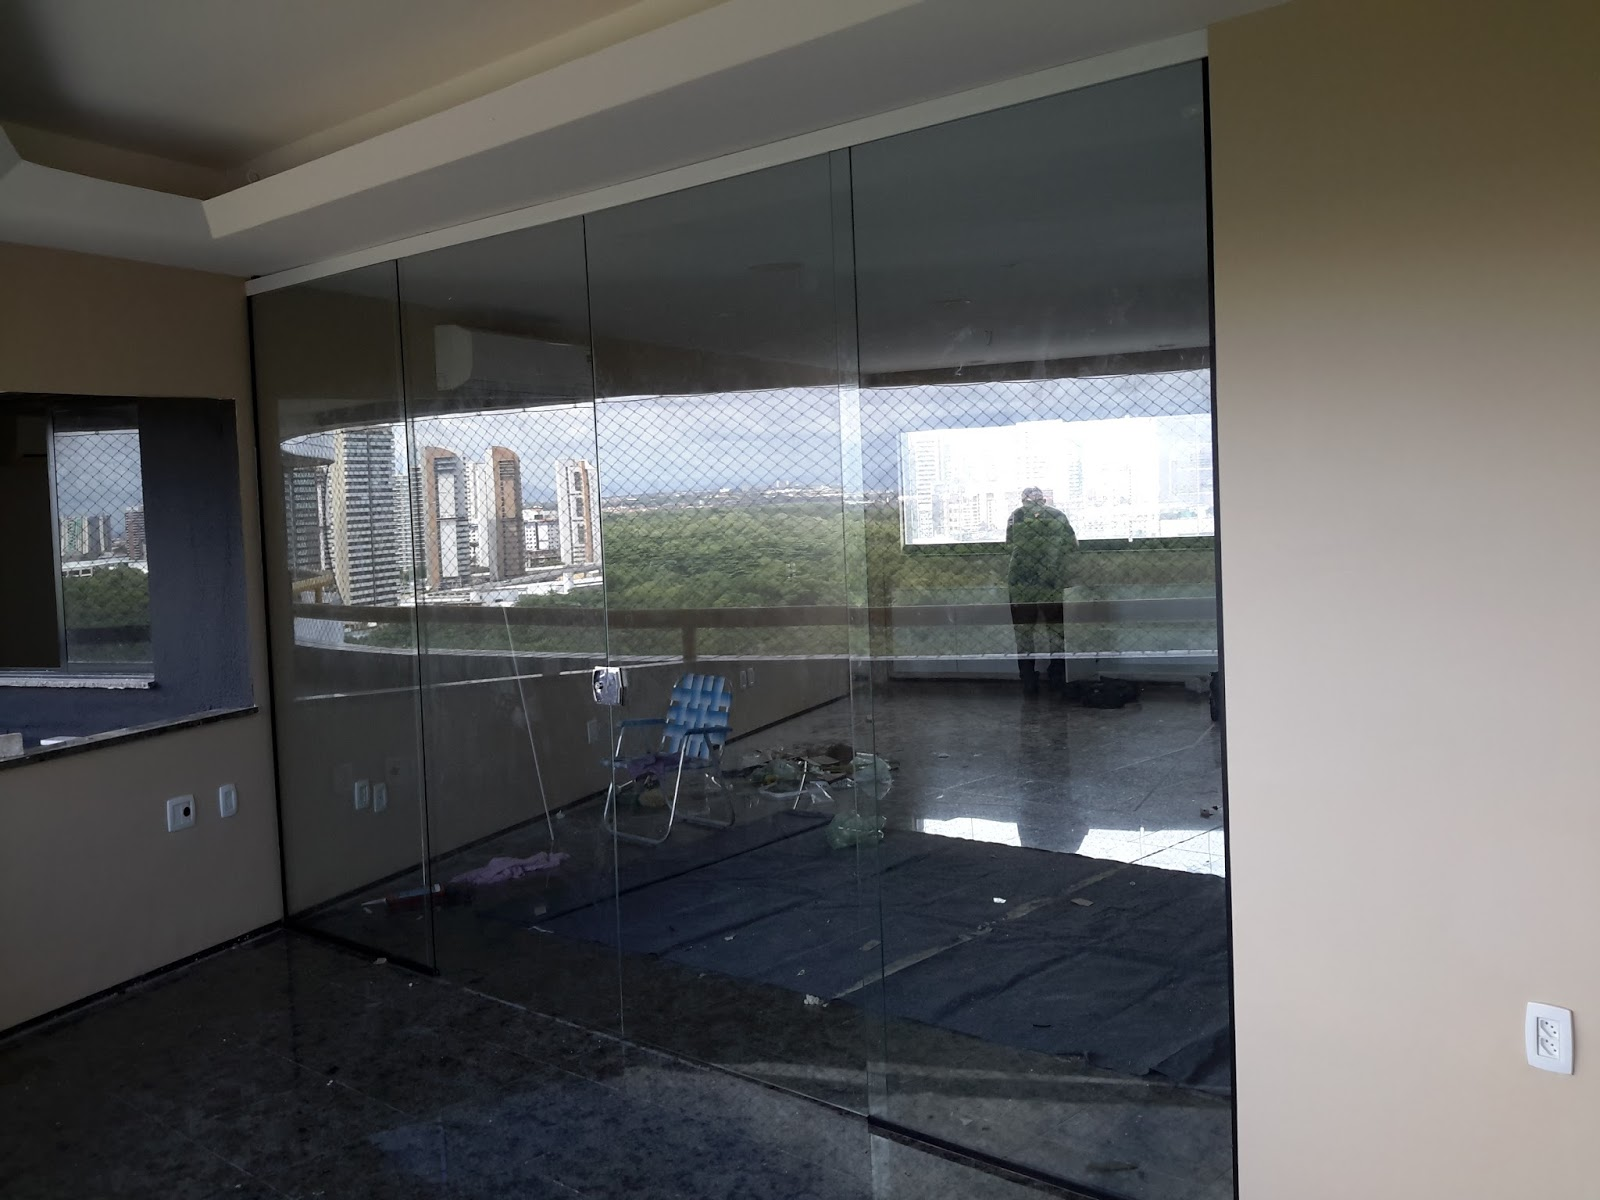 #59503D  VIDRAÇARIA : JANELA E PORTA M 2000 DE VIDRO TEMPERADO EM FORTALEZA 414 Janelas De Vidros Em Fortaleza